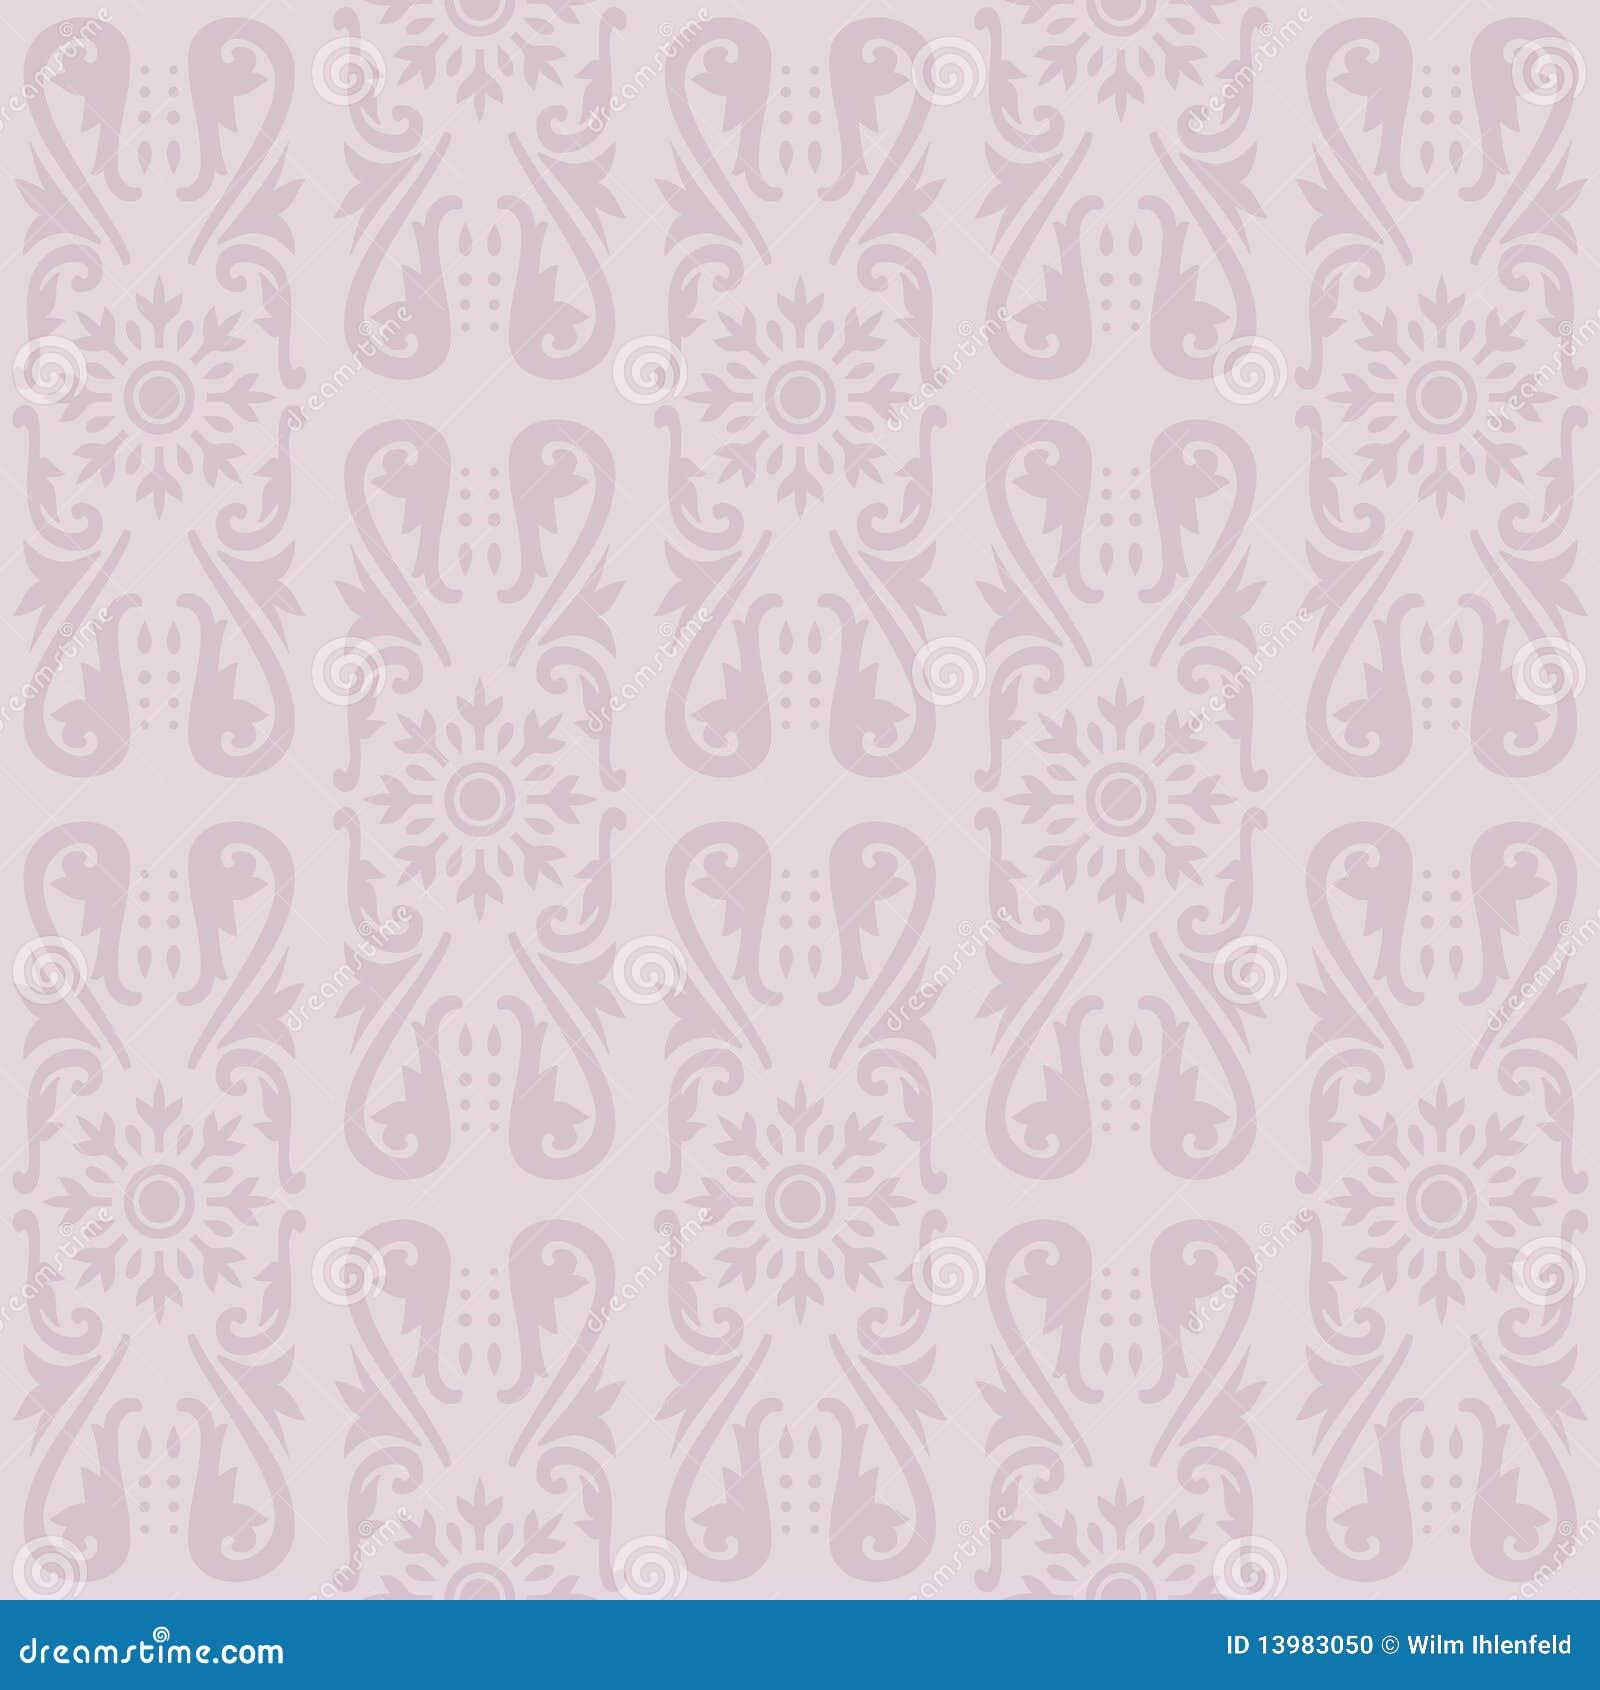 violette tapete 13983050 - Violette Tapete